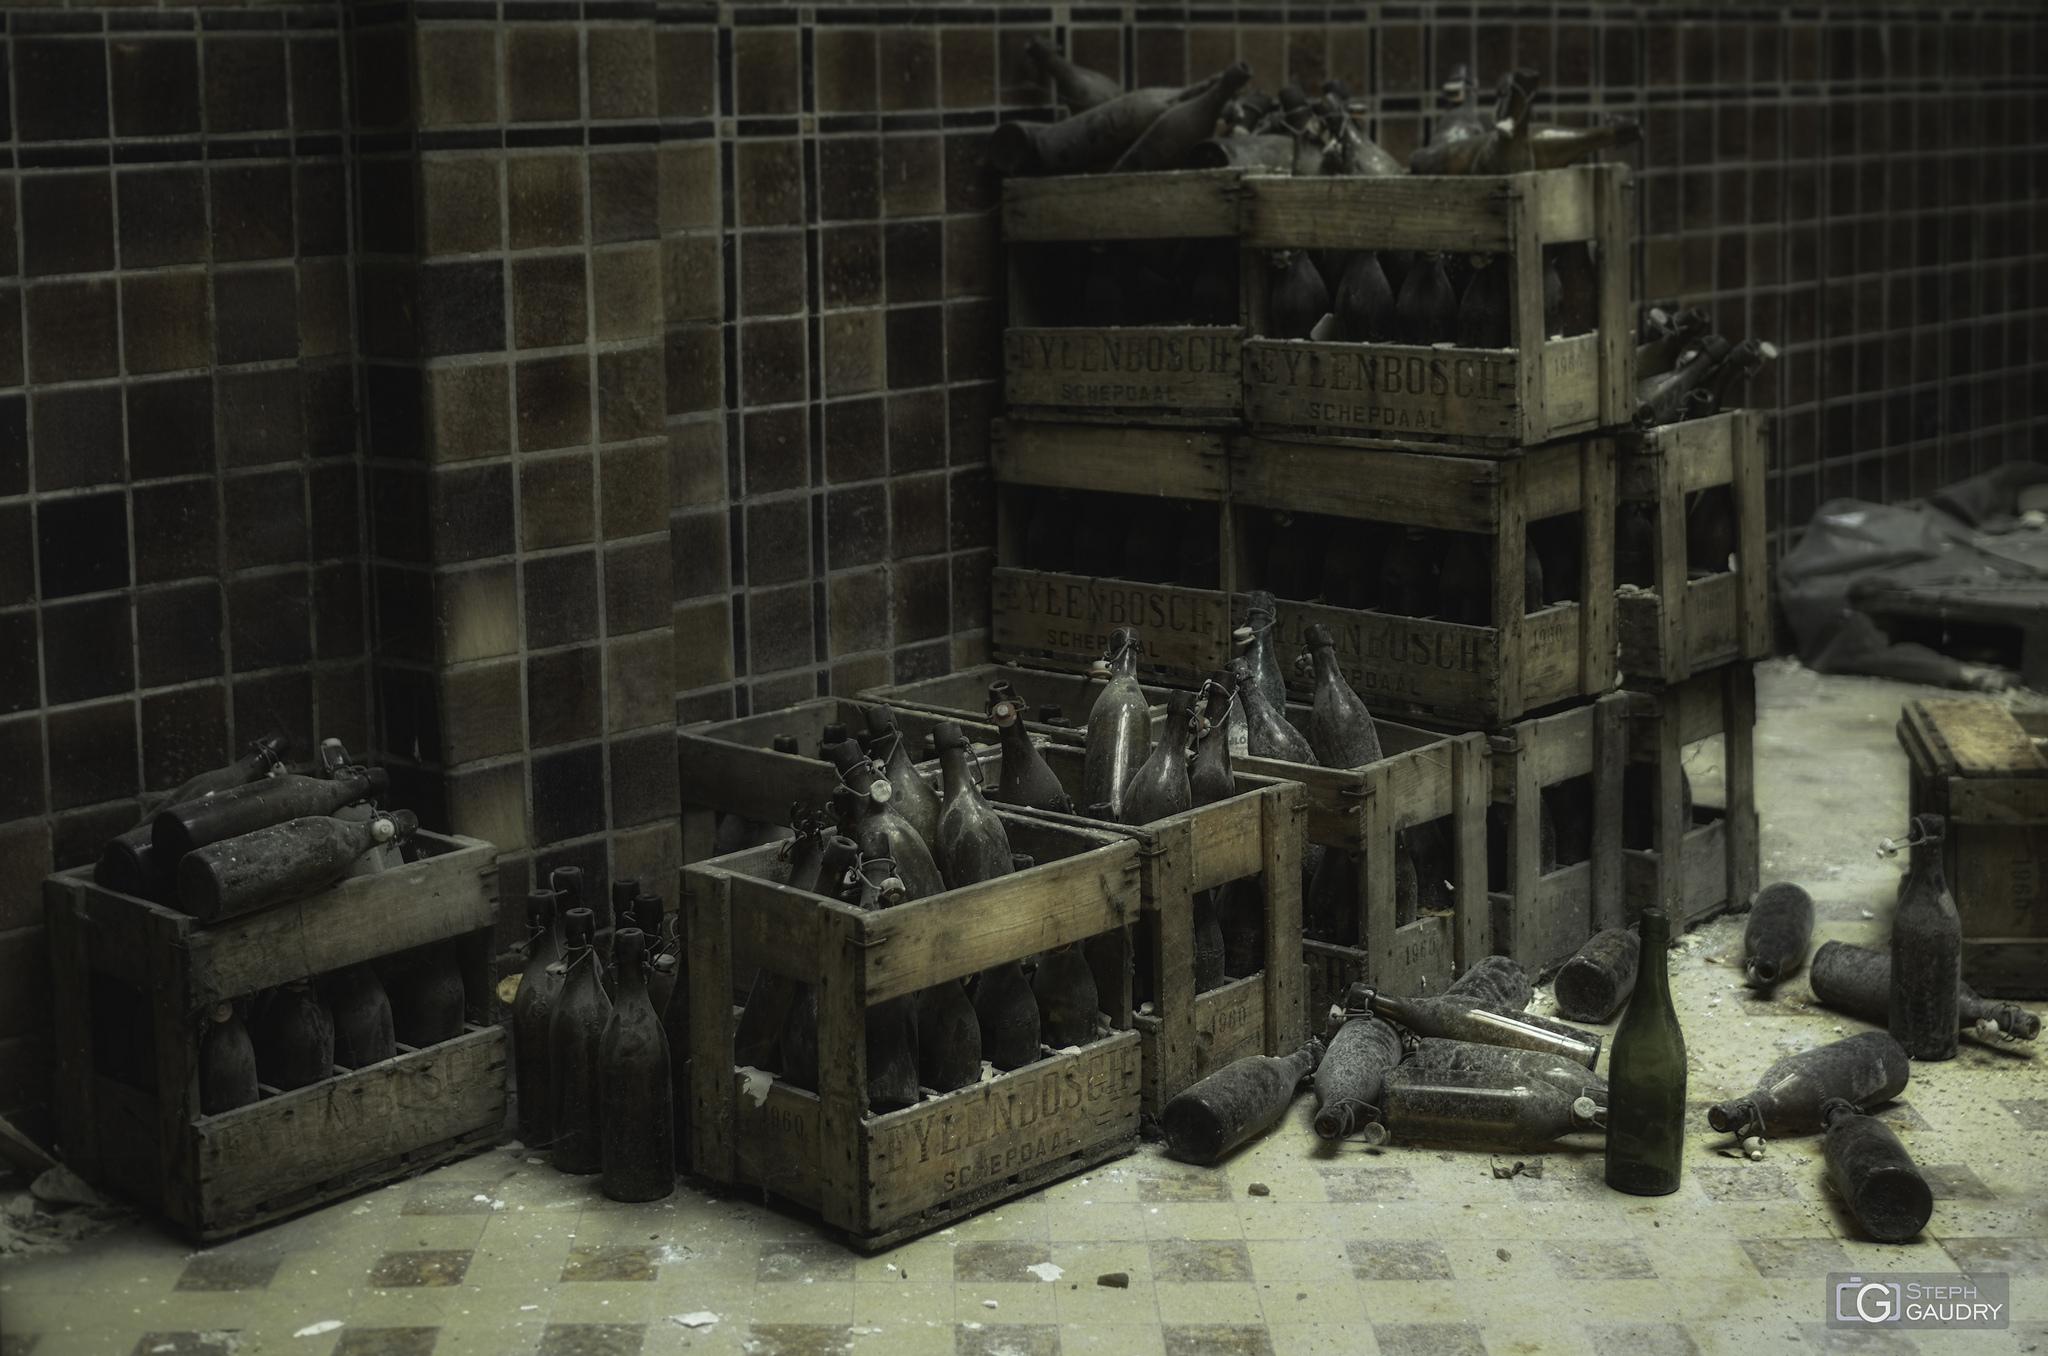 Eylenbosch [Cliquez pour lancer le diaporama]